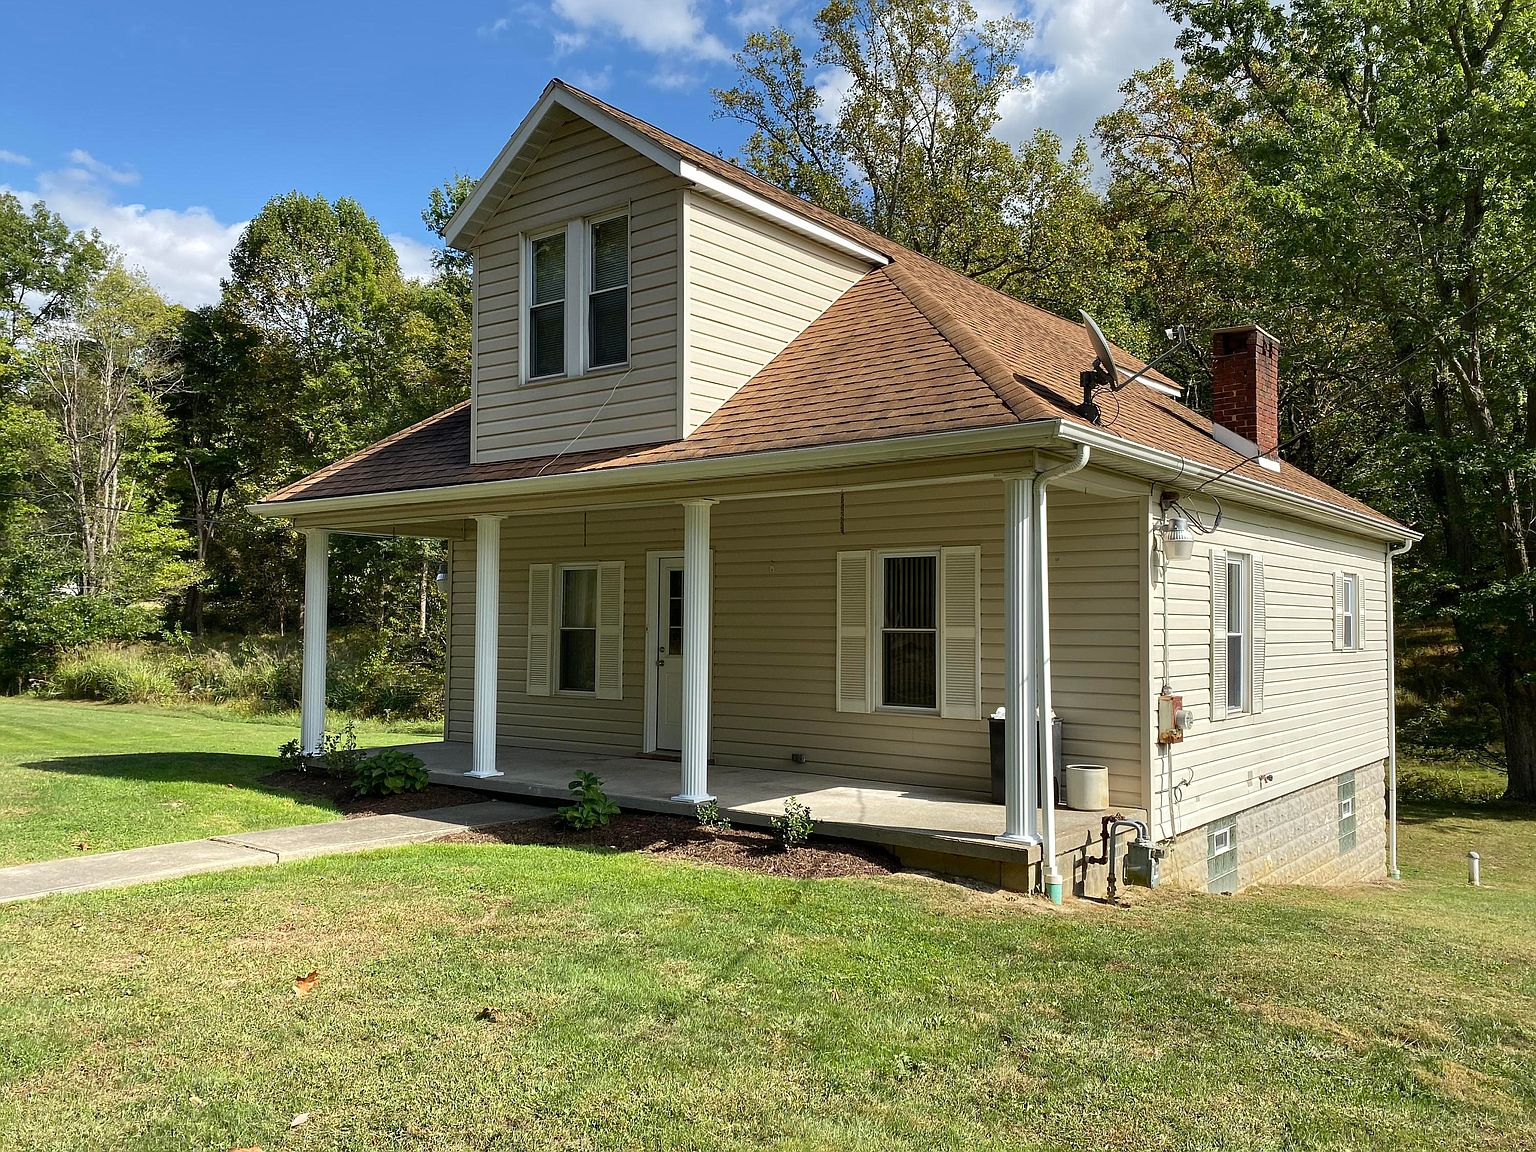 138 Mountain Rd Uniontown Pa 15401 Zillow